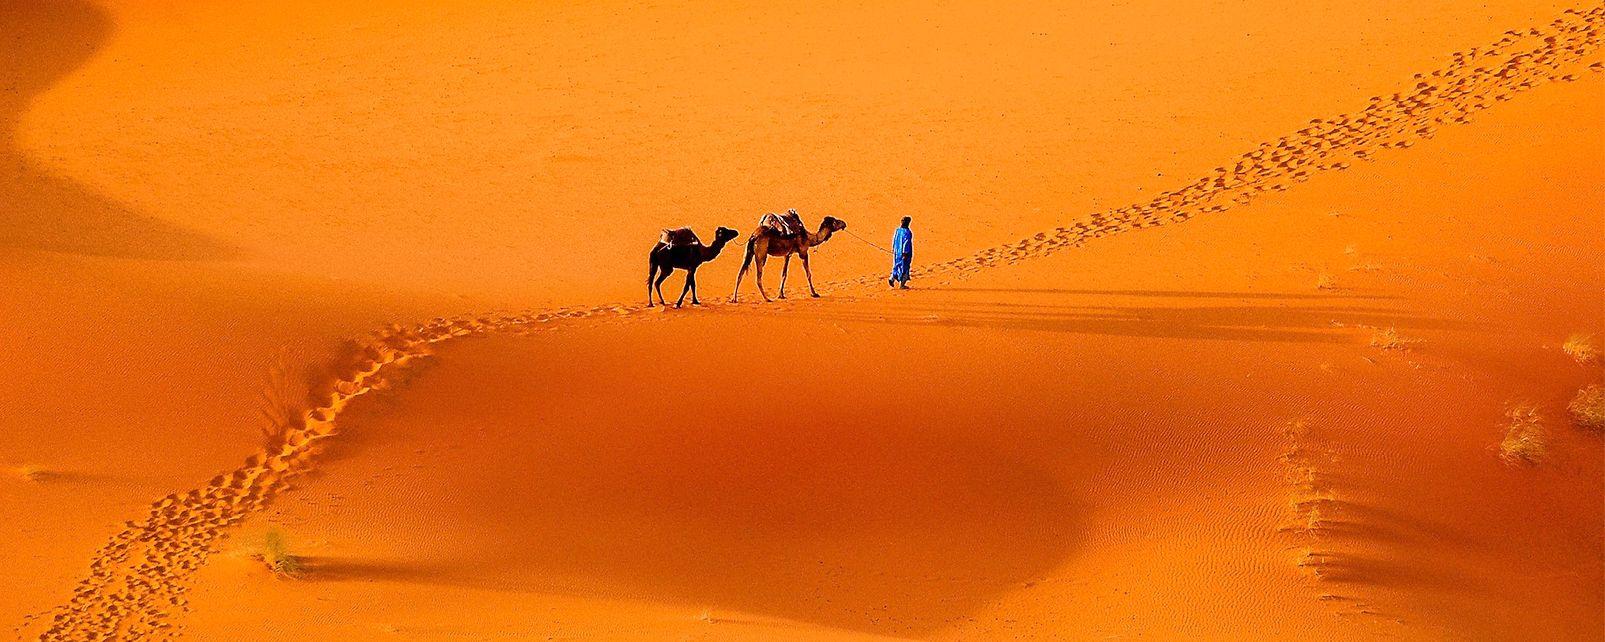 , Le Sahara Occidental, Les paysages, Maroc-Le Sud